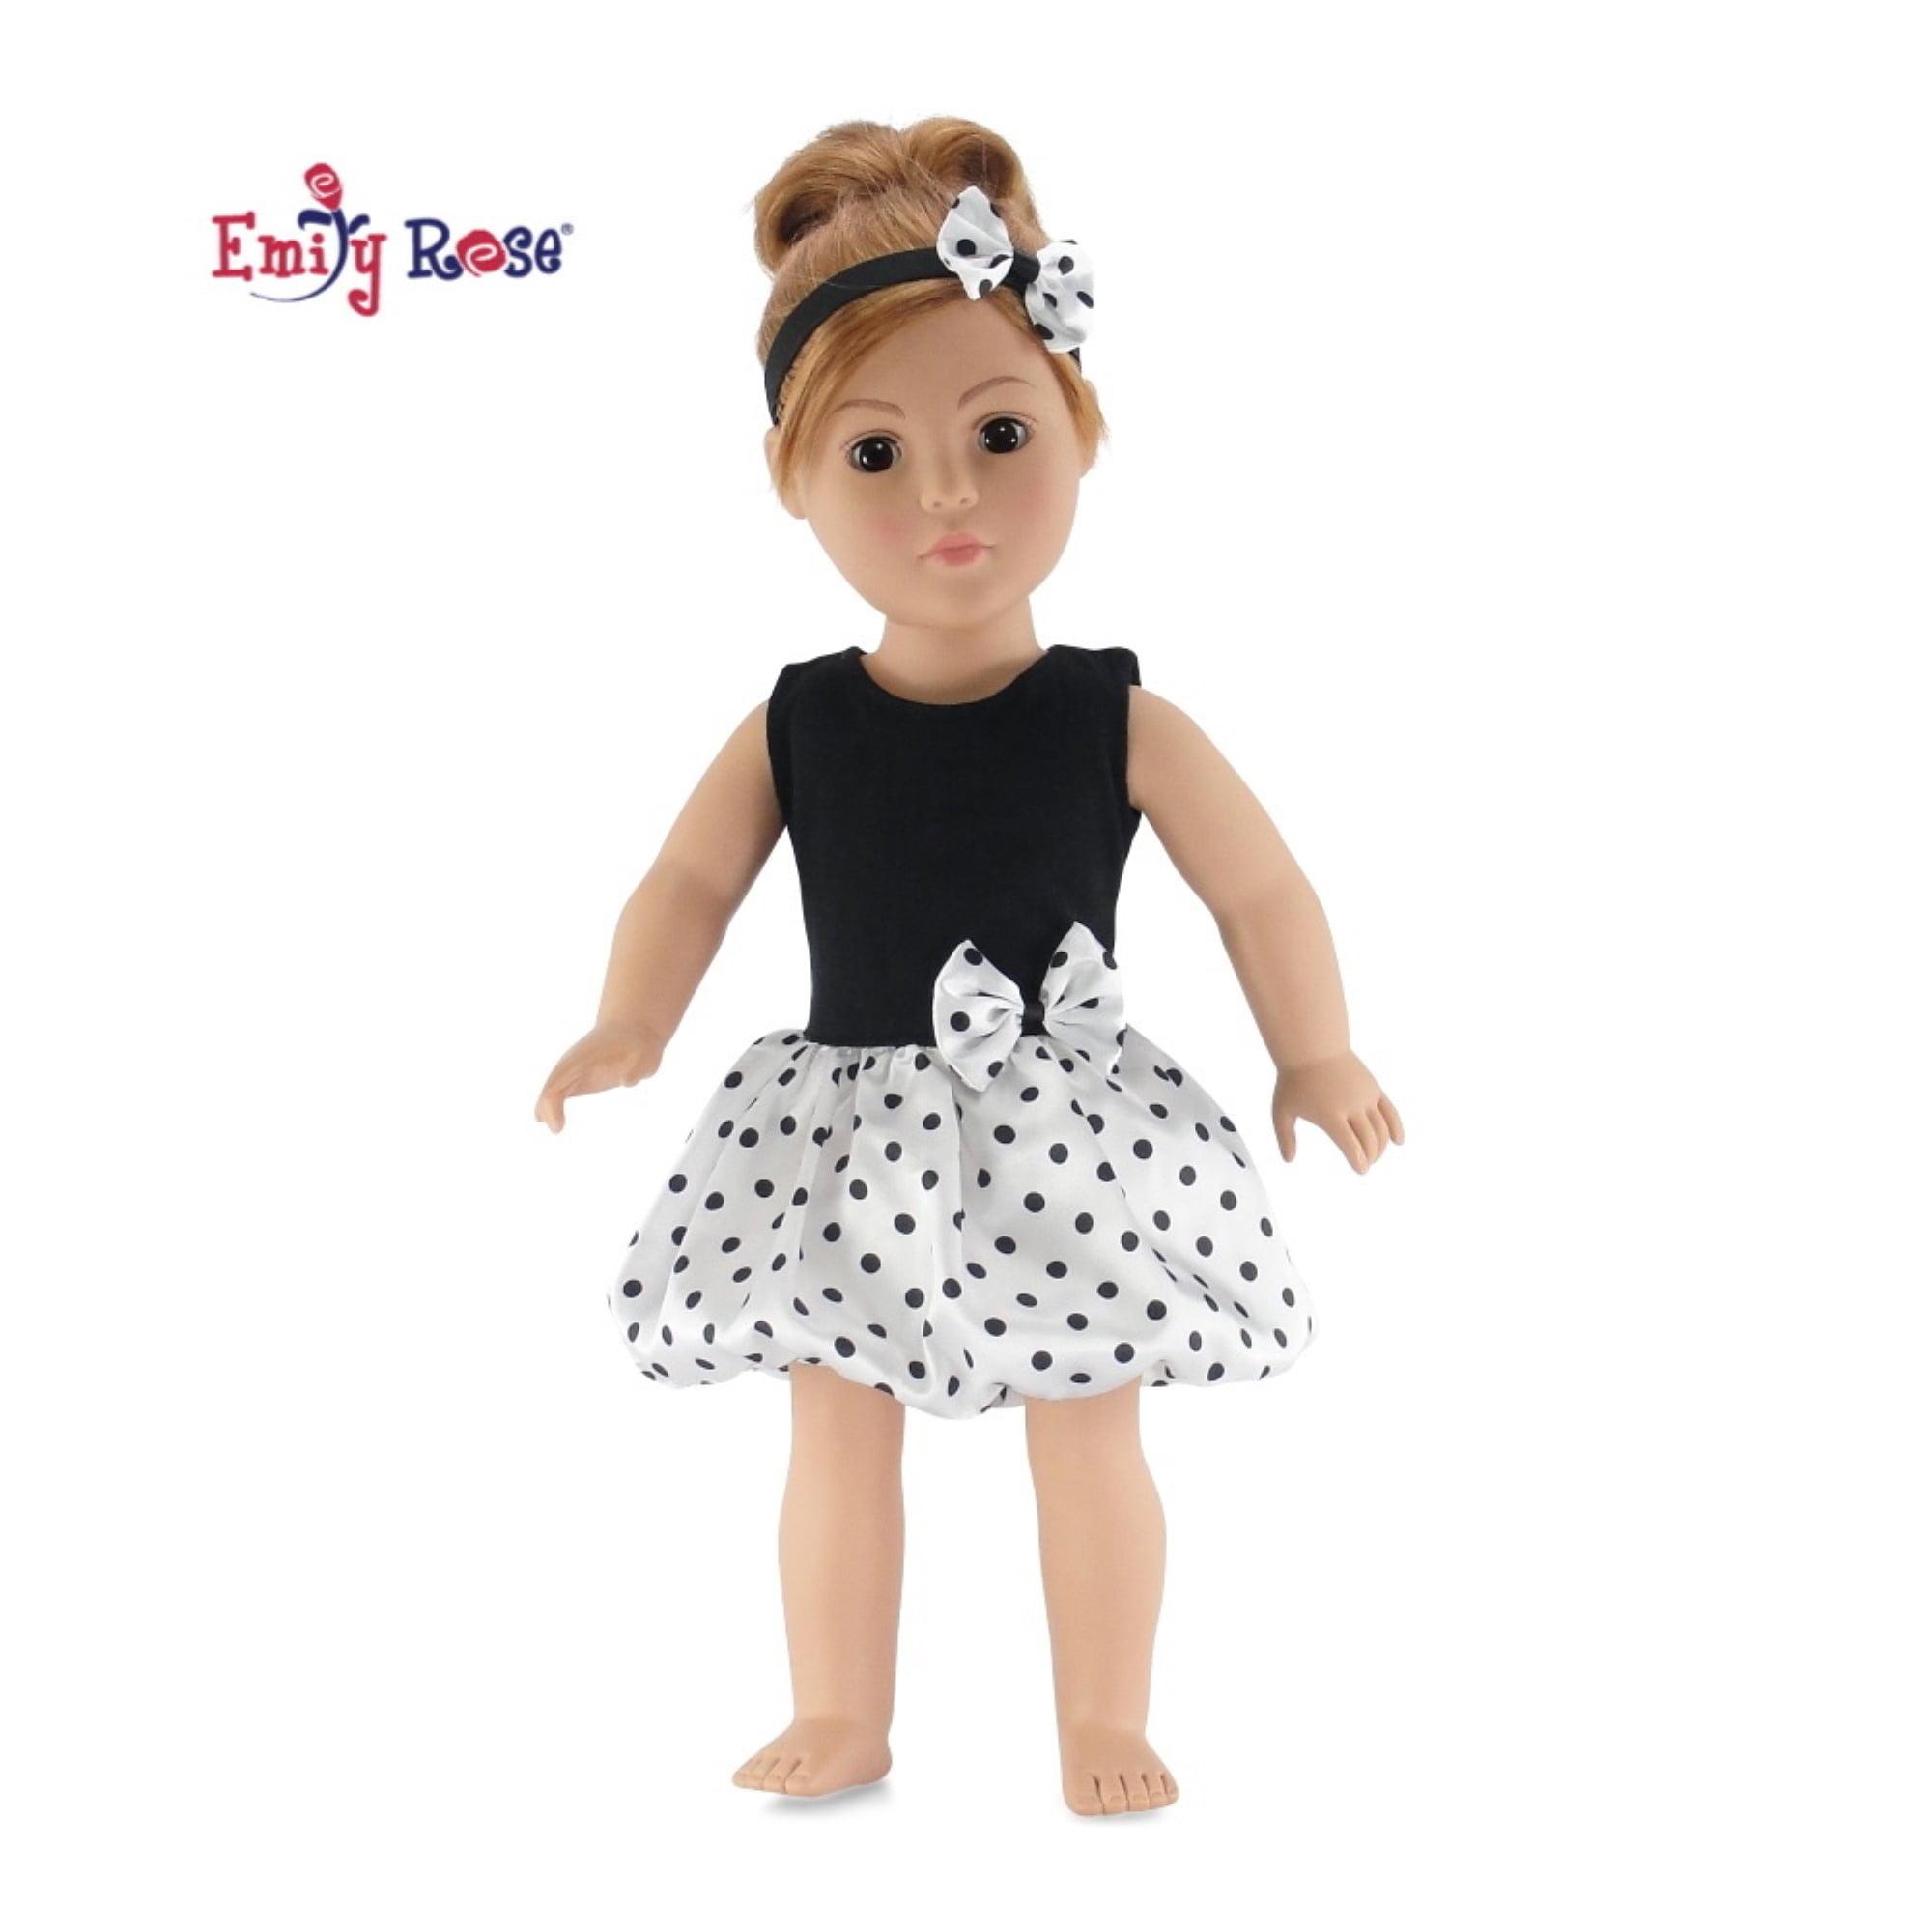 Doll Polka Dot Tights Set of 3 Polka Dot Tights For 18 inch Dolls